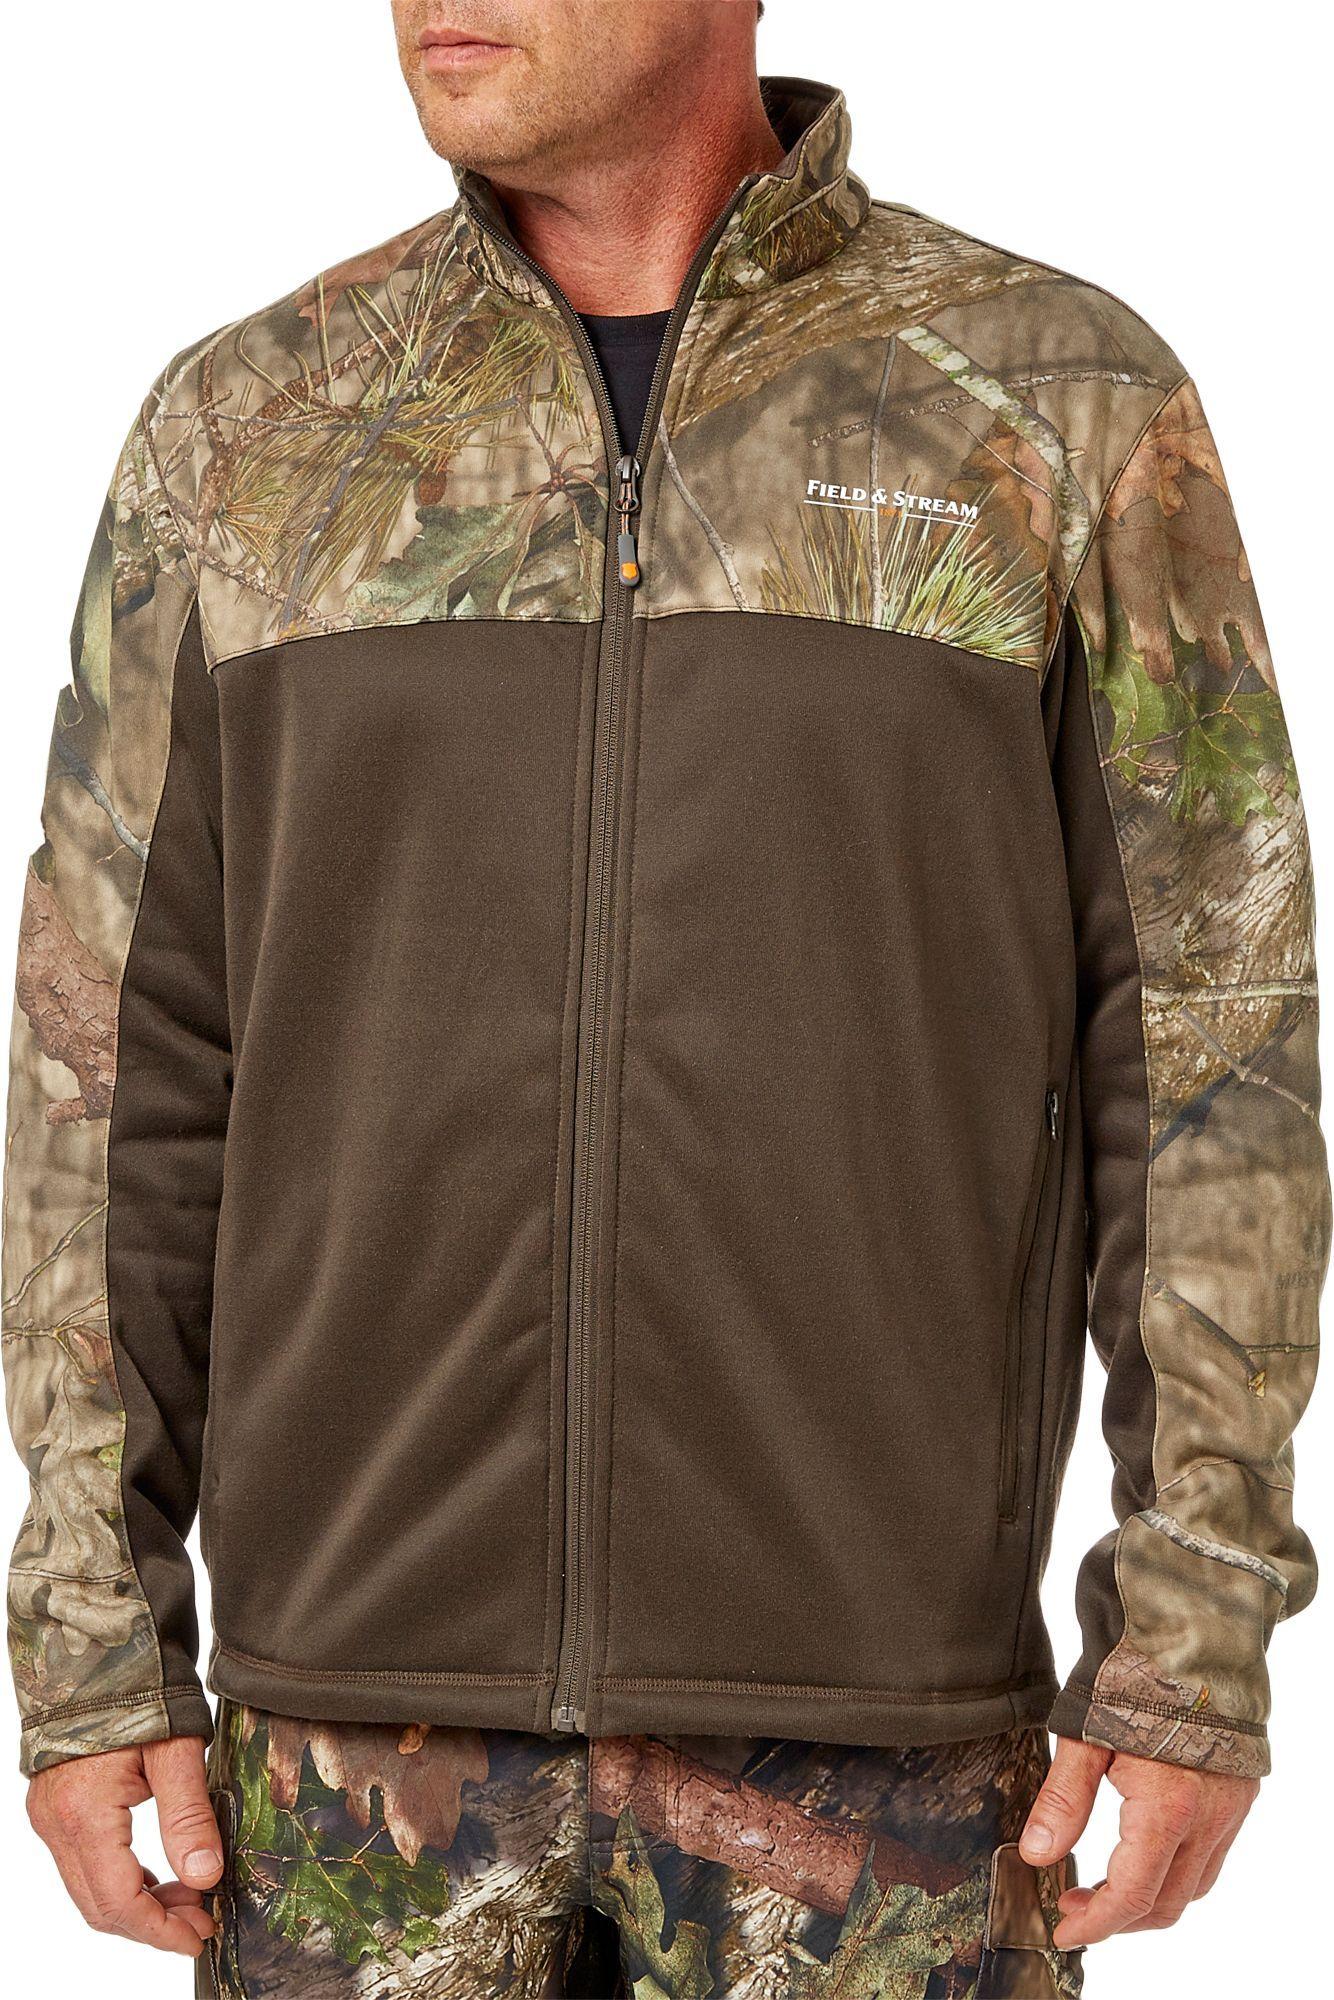 Field u stream menus fleece hunting jacket in products